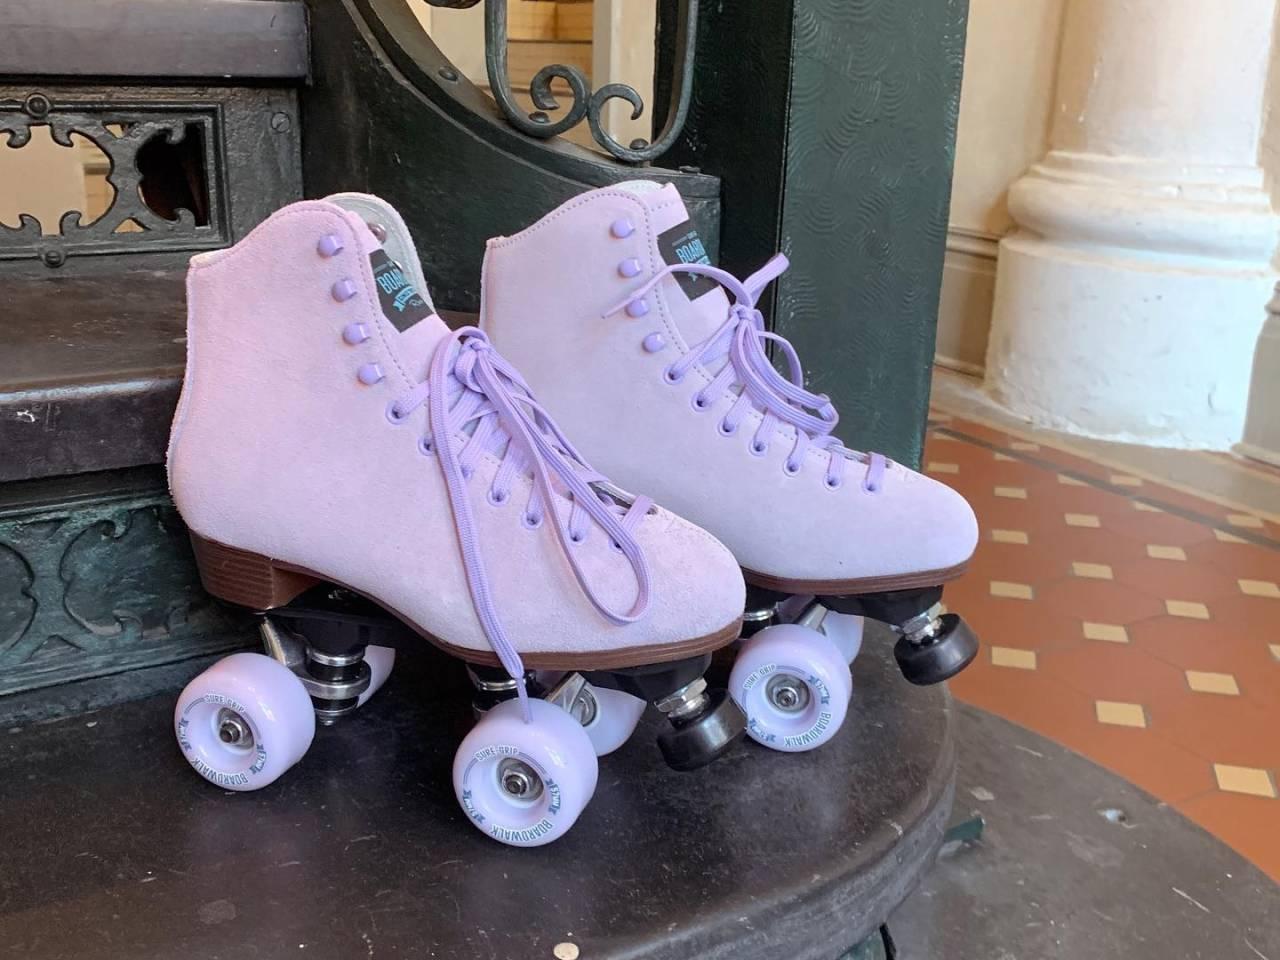 Reverie Skate Shop